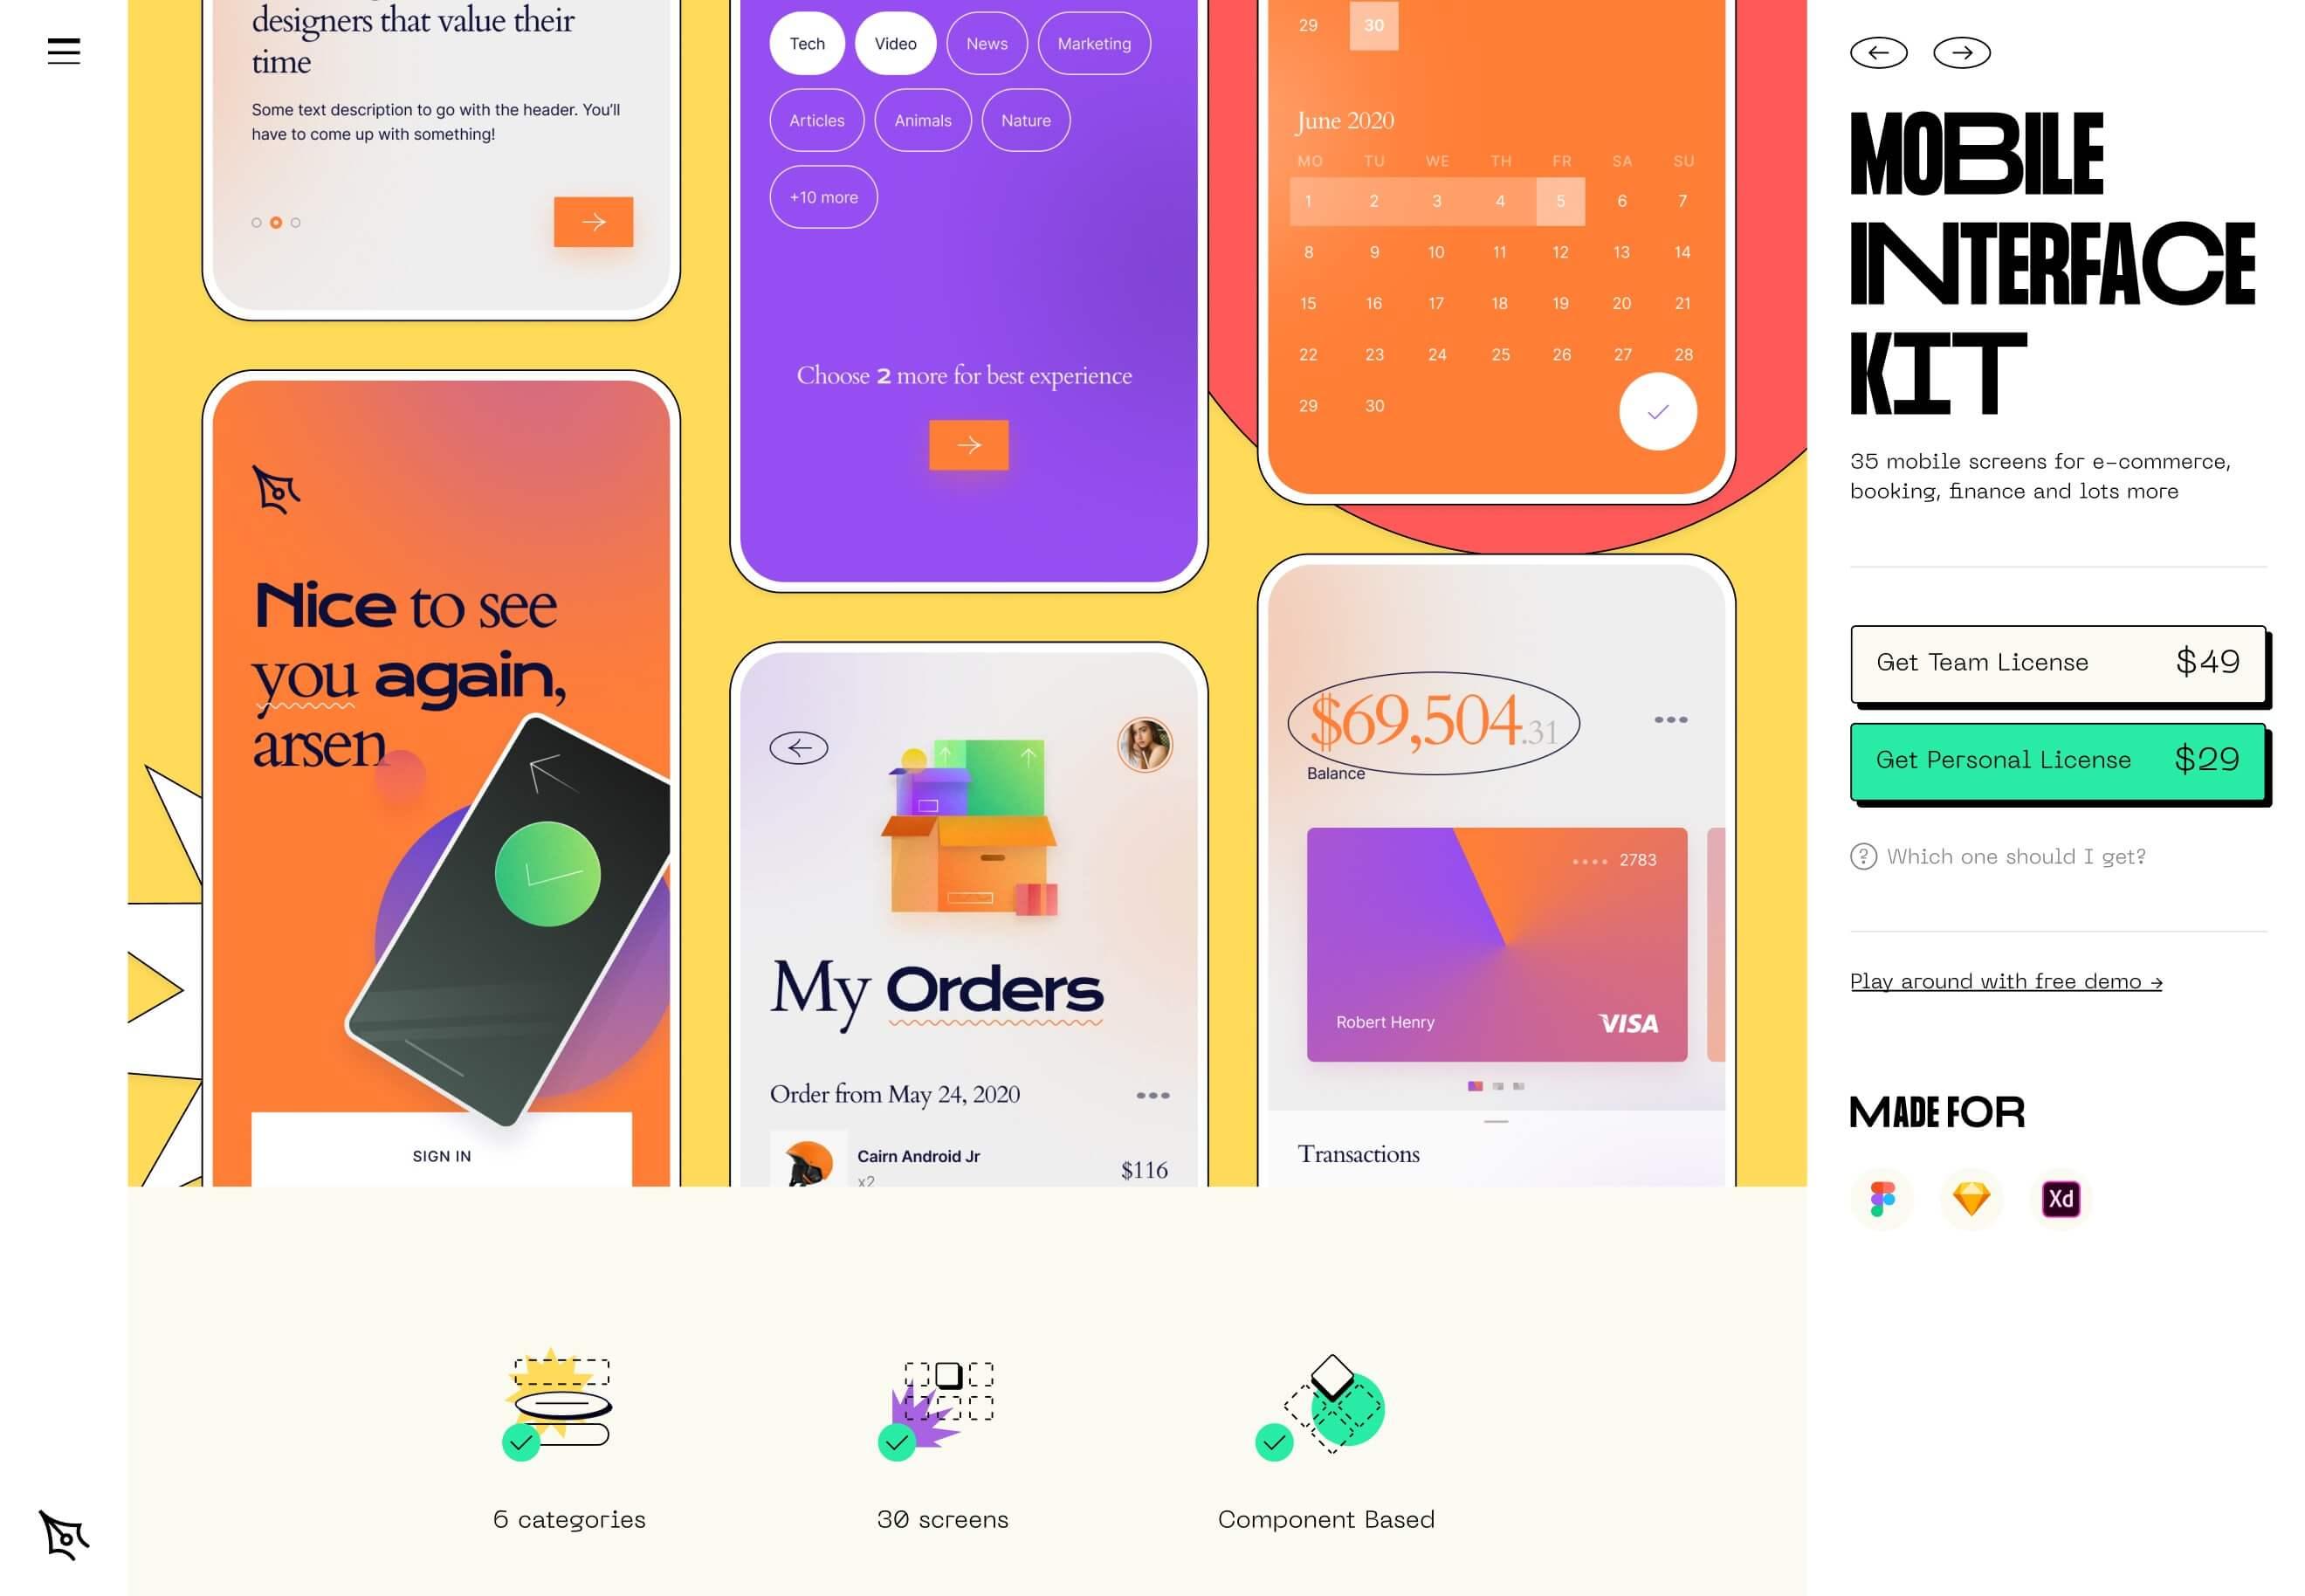 Desktop product page